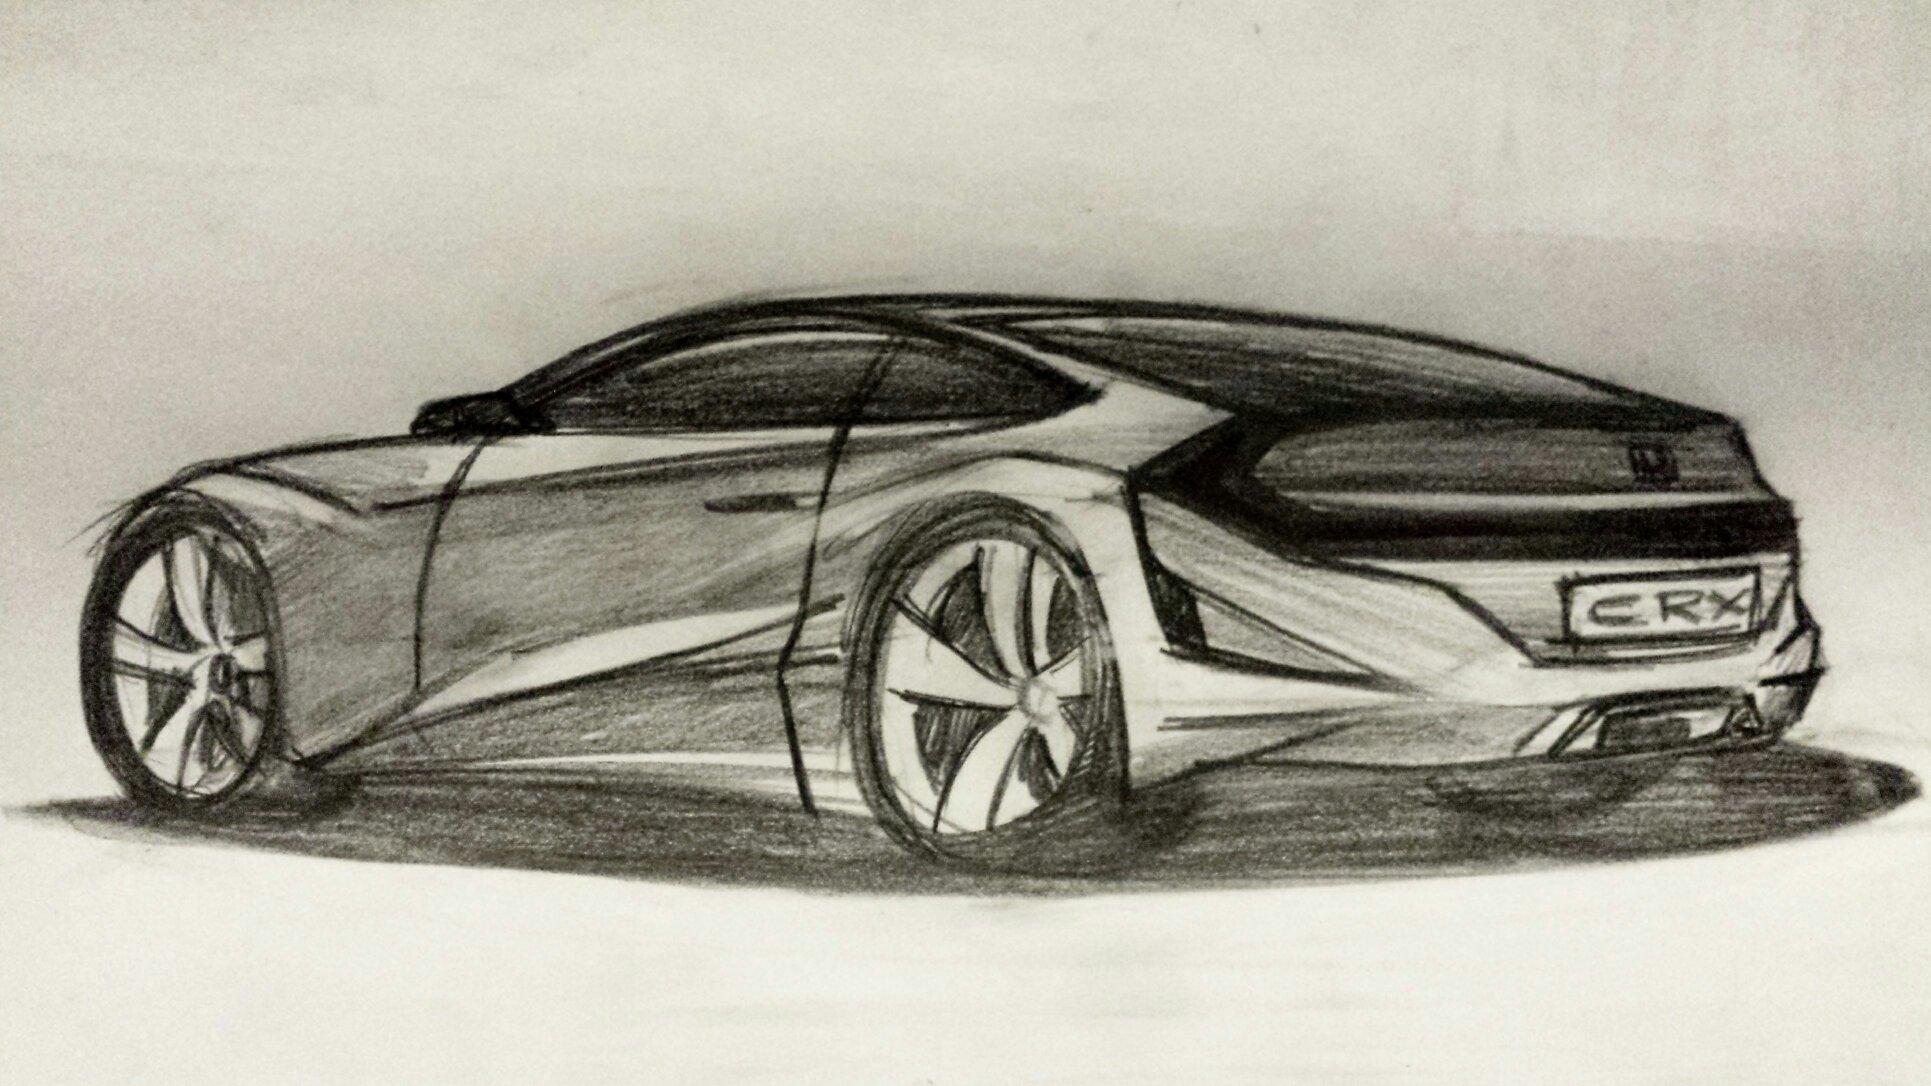 Honda Crx Concept Sketch